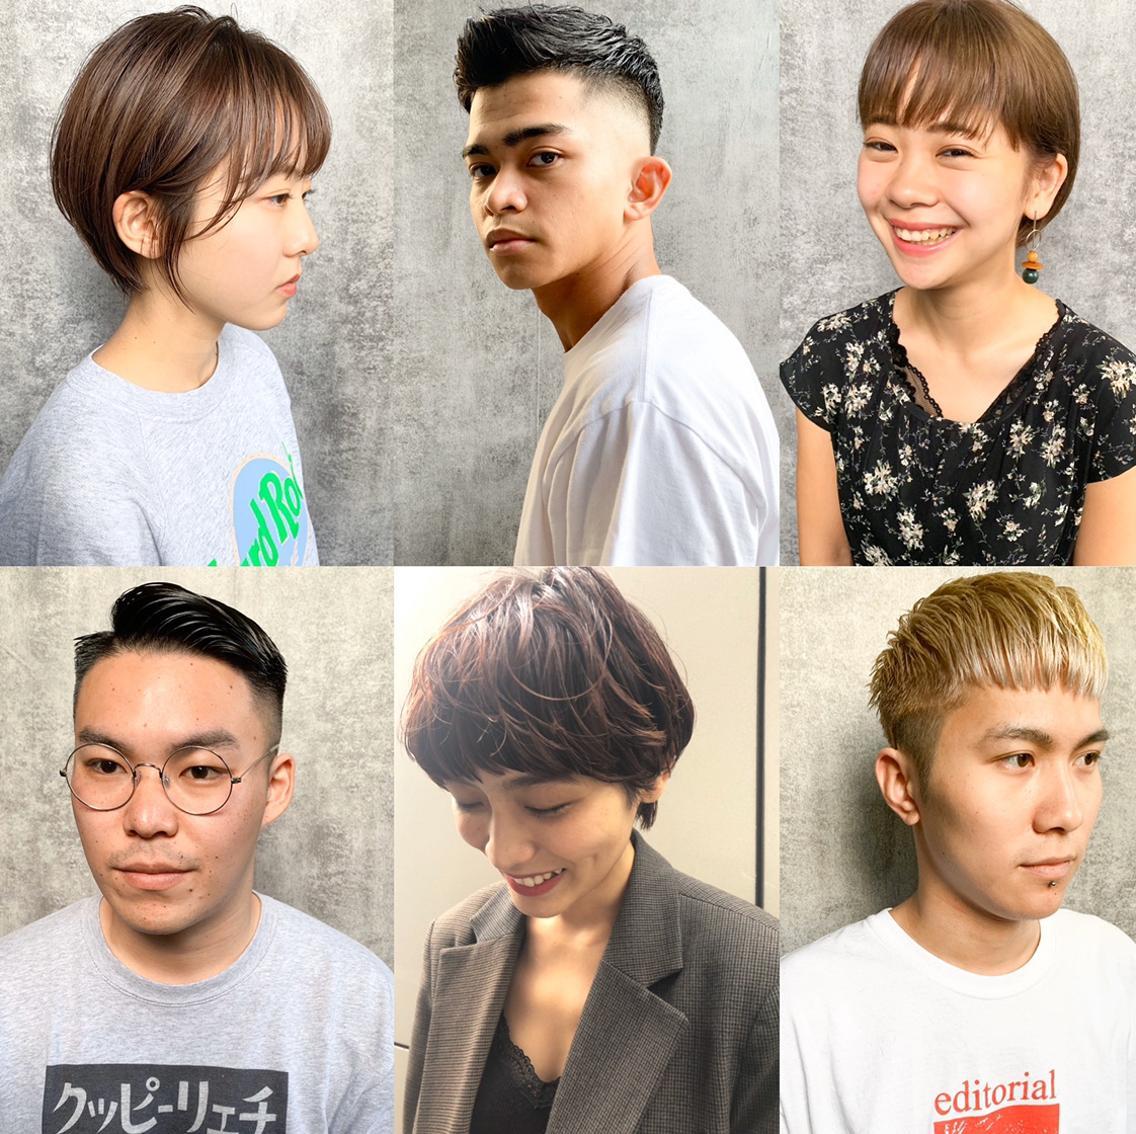 Eight渋谷本店所属・中谷蓮の掲載